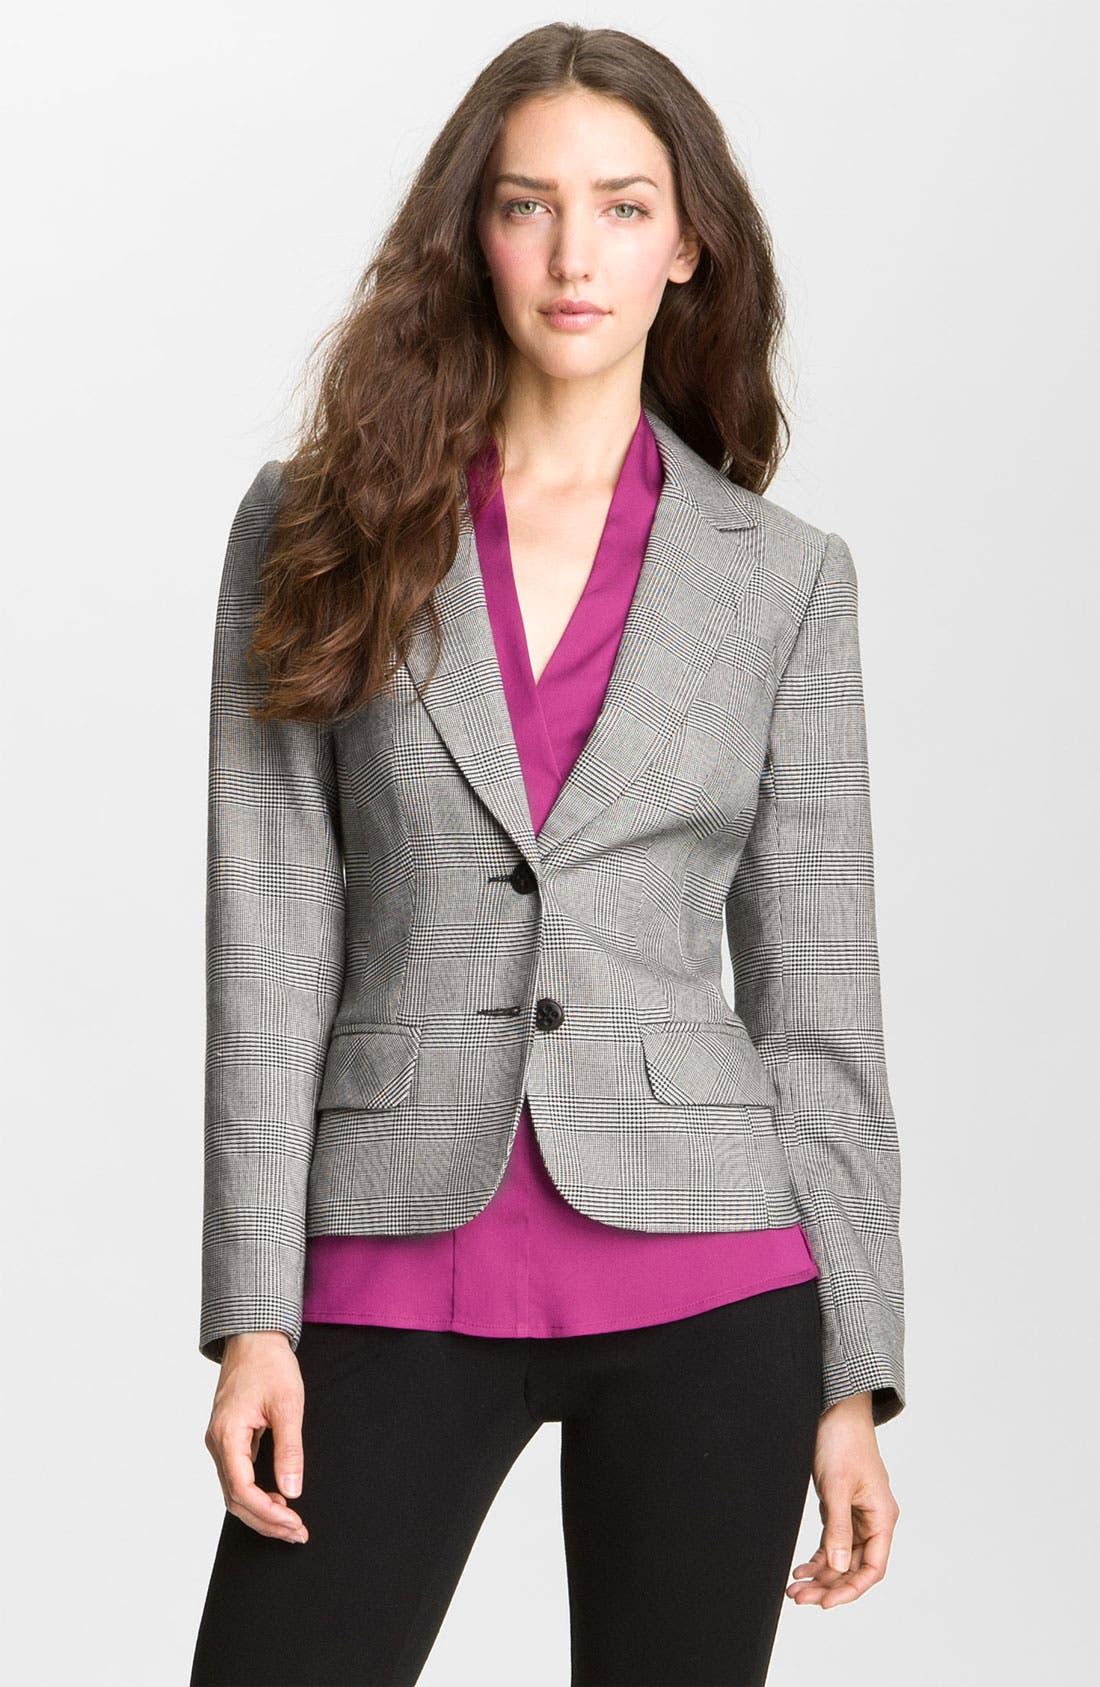 Alternate Image 1 Selected - Trina Turk 'Ivy League' Blazer (Online Exclusive)